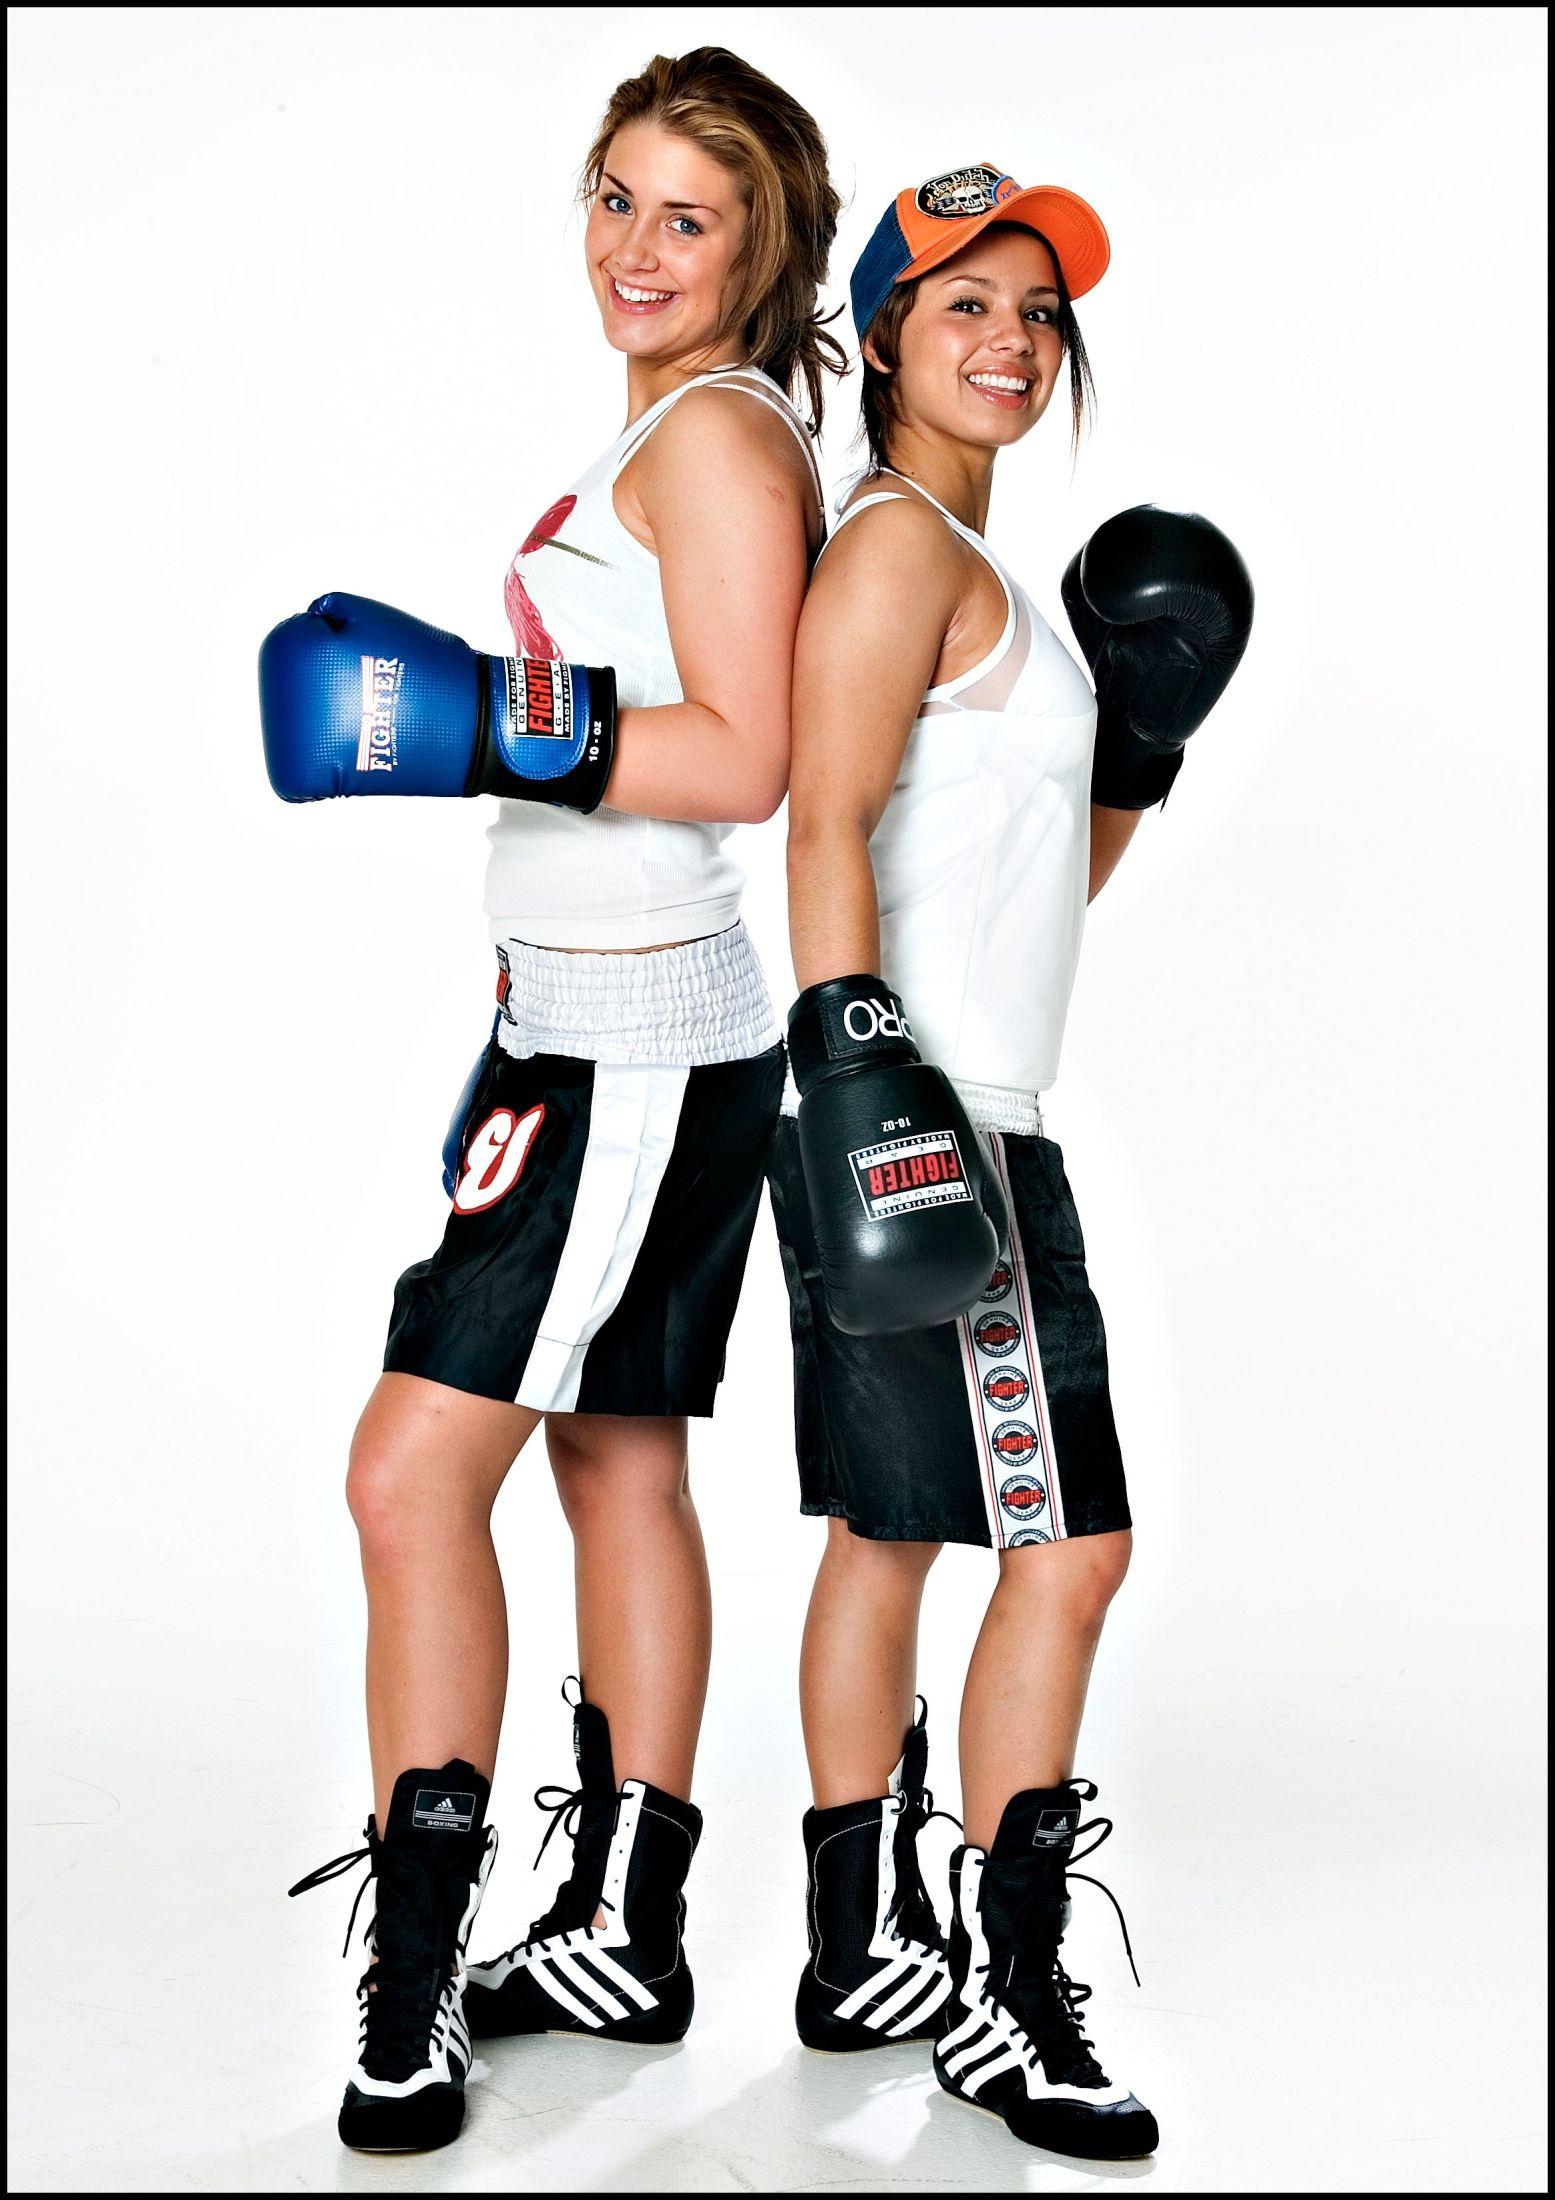 FINALEDUELL: Tone Damli Aaberge og Jorun Stiansen var Idol-finalister i 2005. Foto: MAGNAR KIRKNES